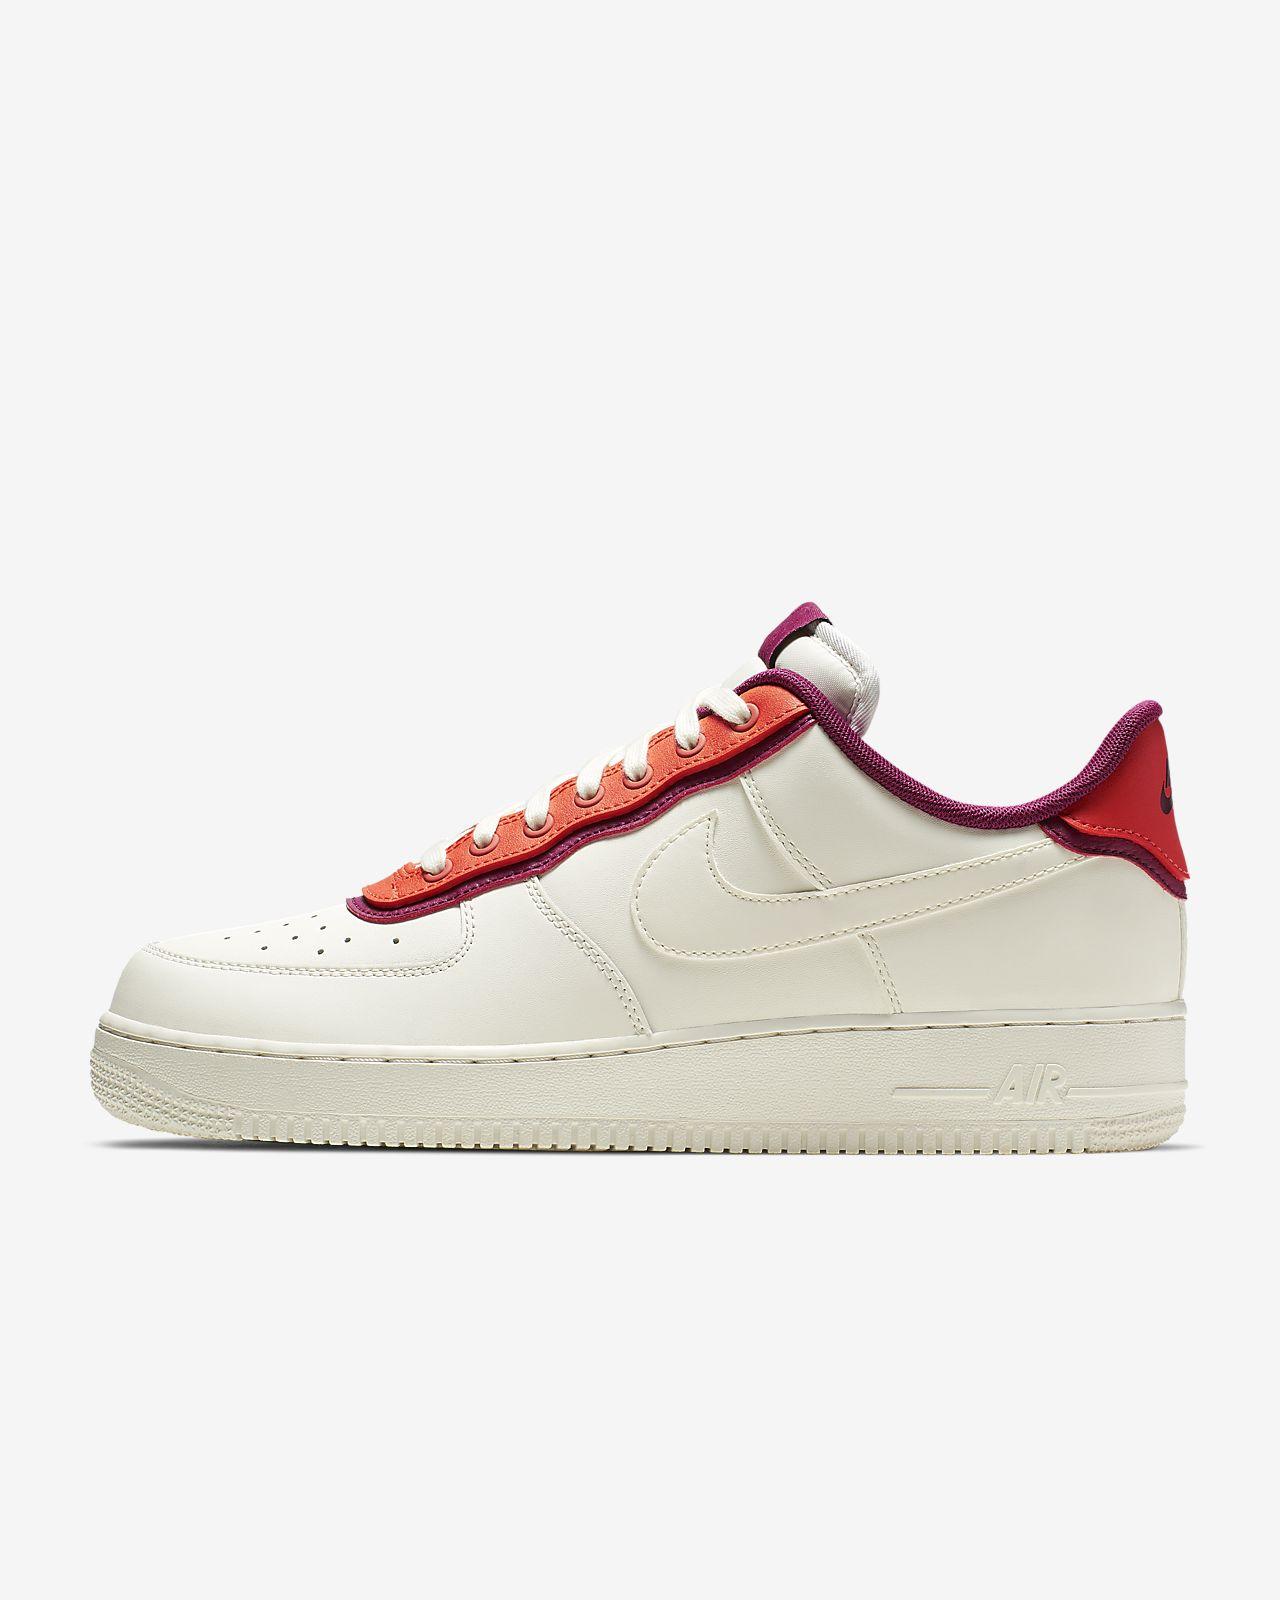 Nike Air Force 1 '07 LV8 1 Herrenschuh